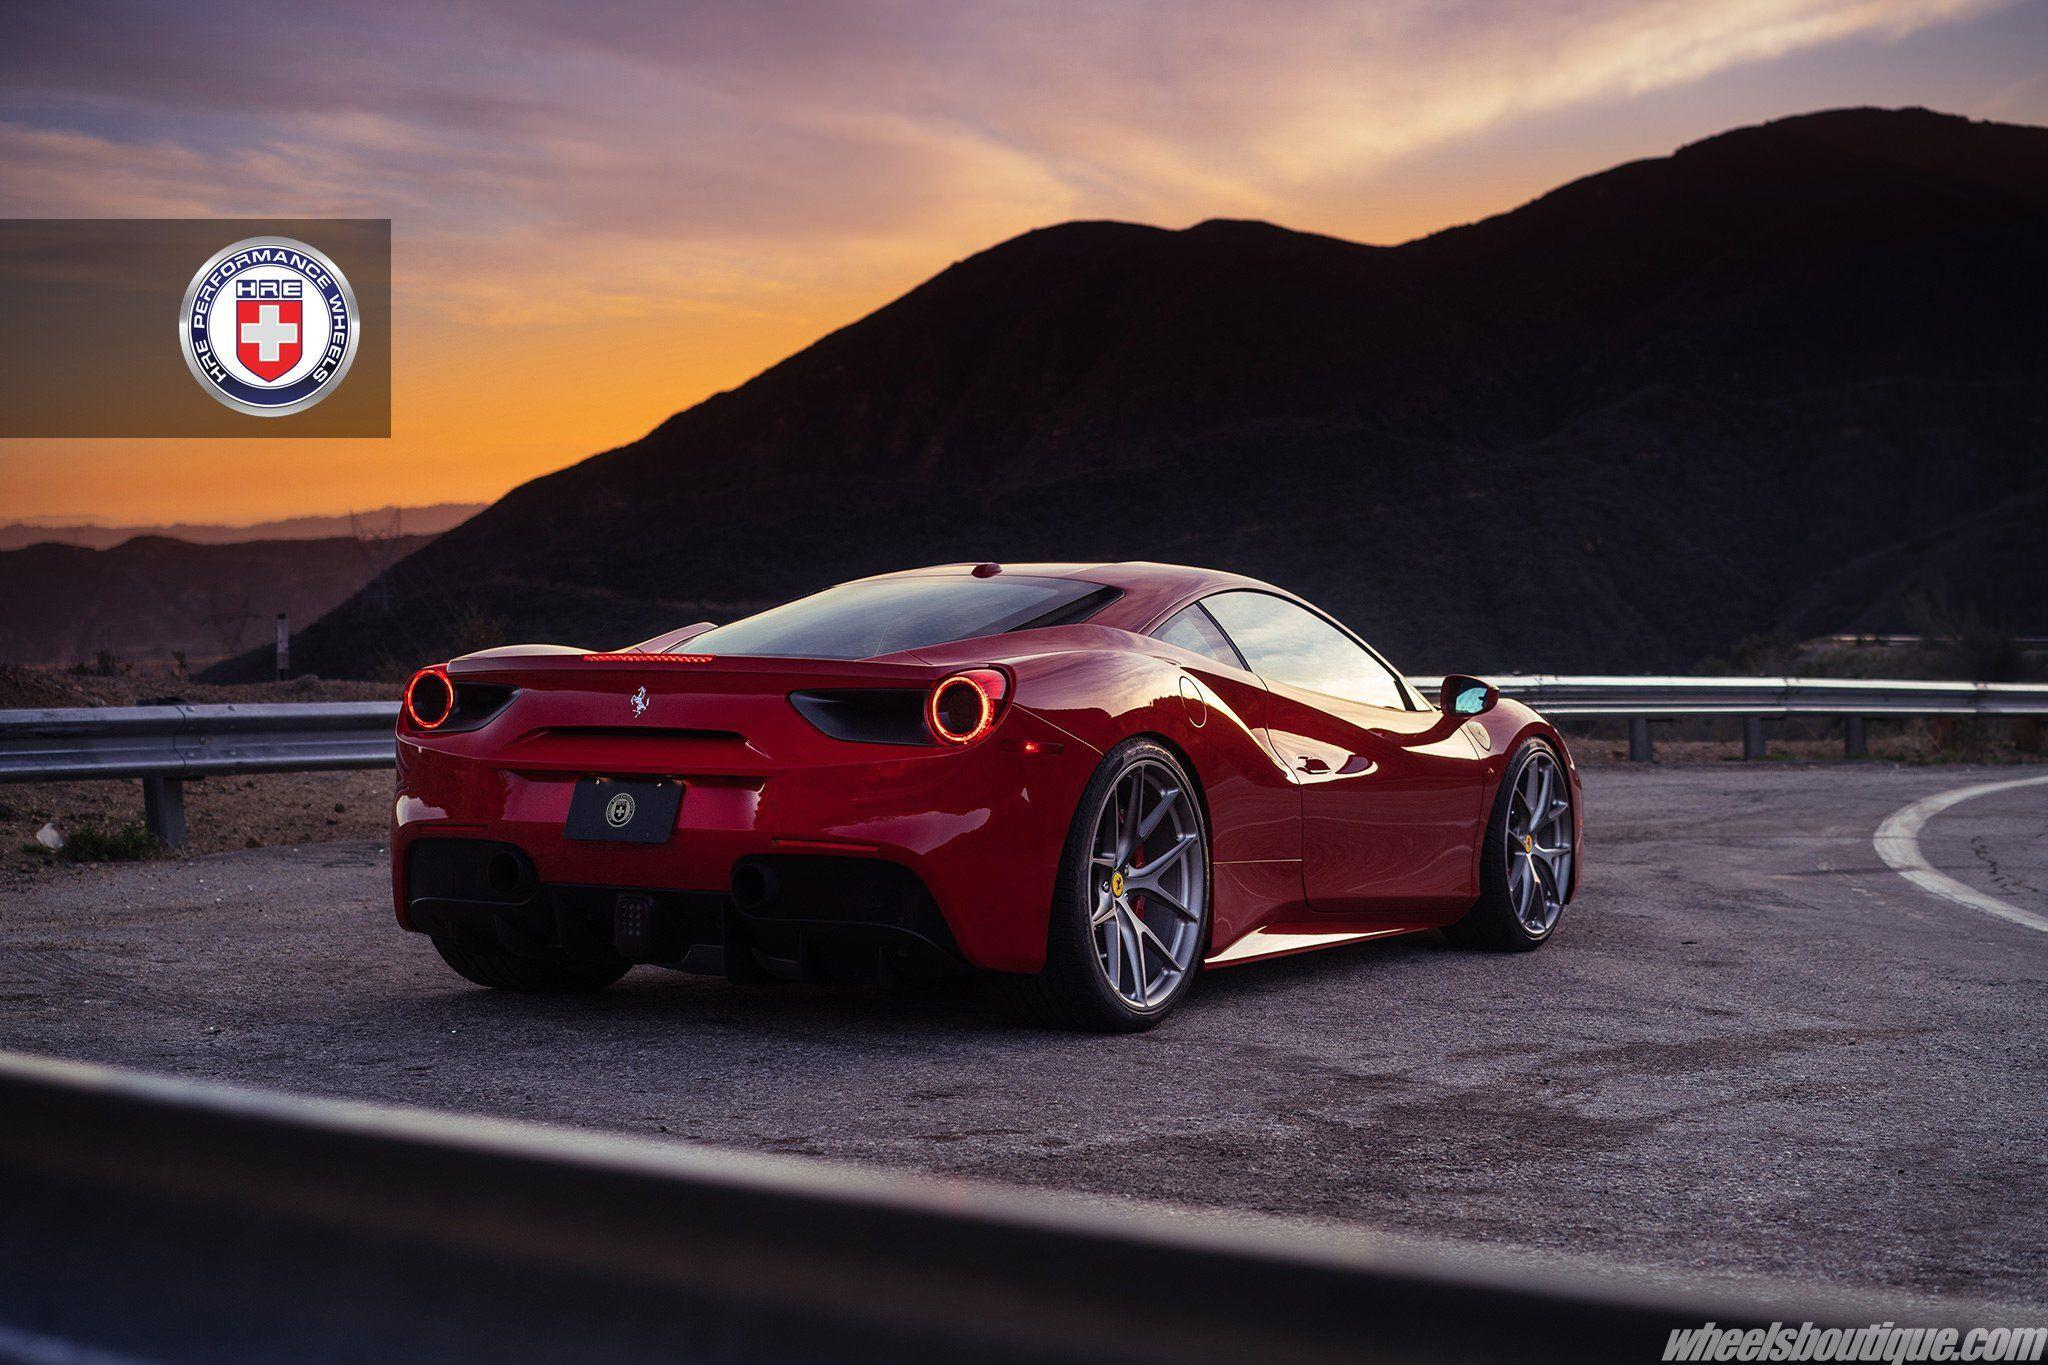 Ferrari 488 Wallpapers For Desktop